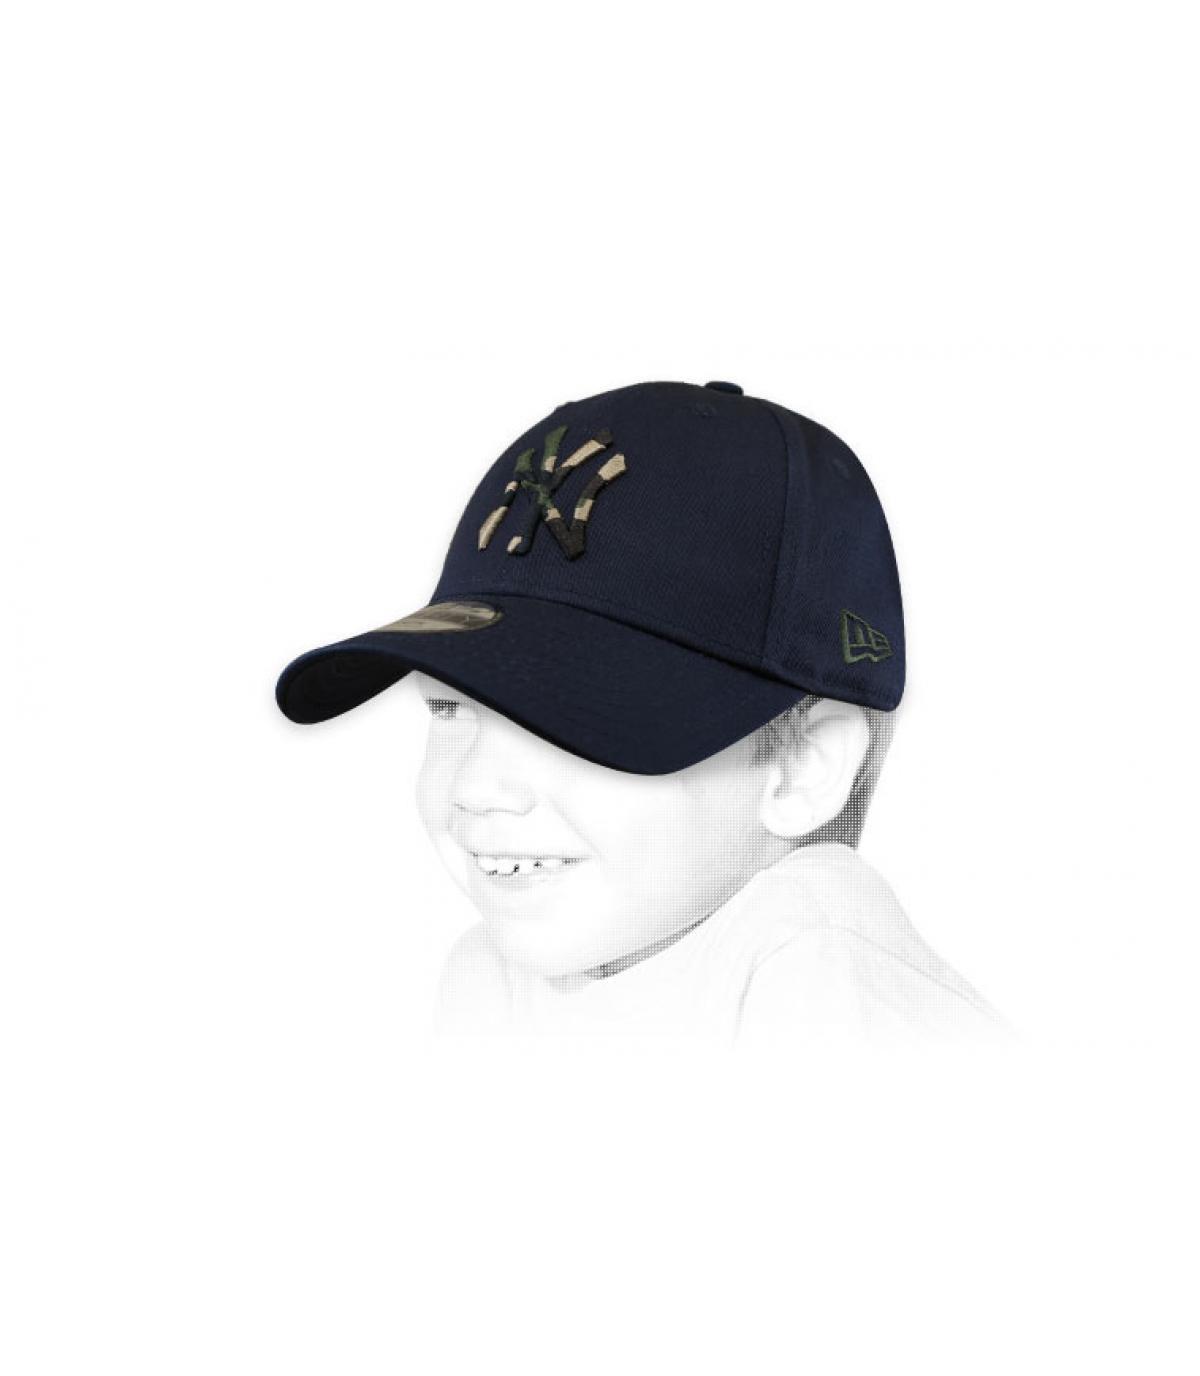 casquette enfant NY bleu camo